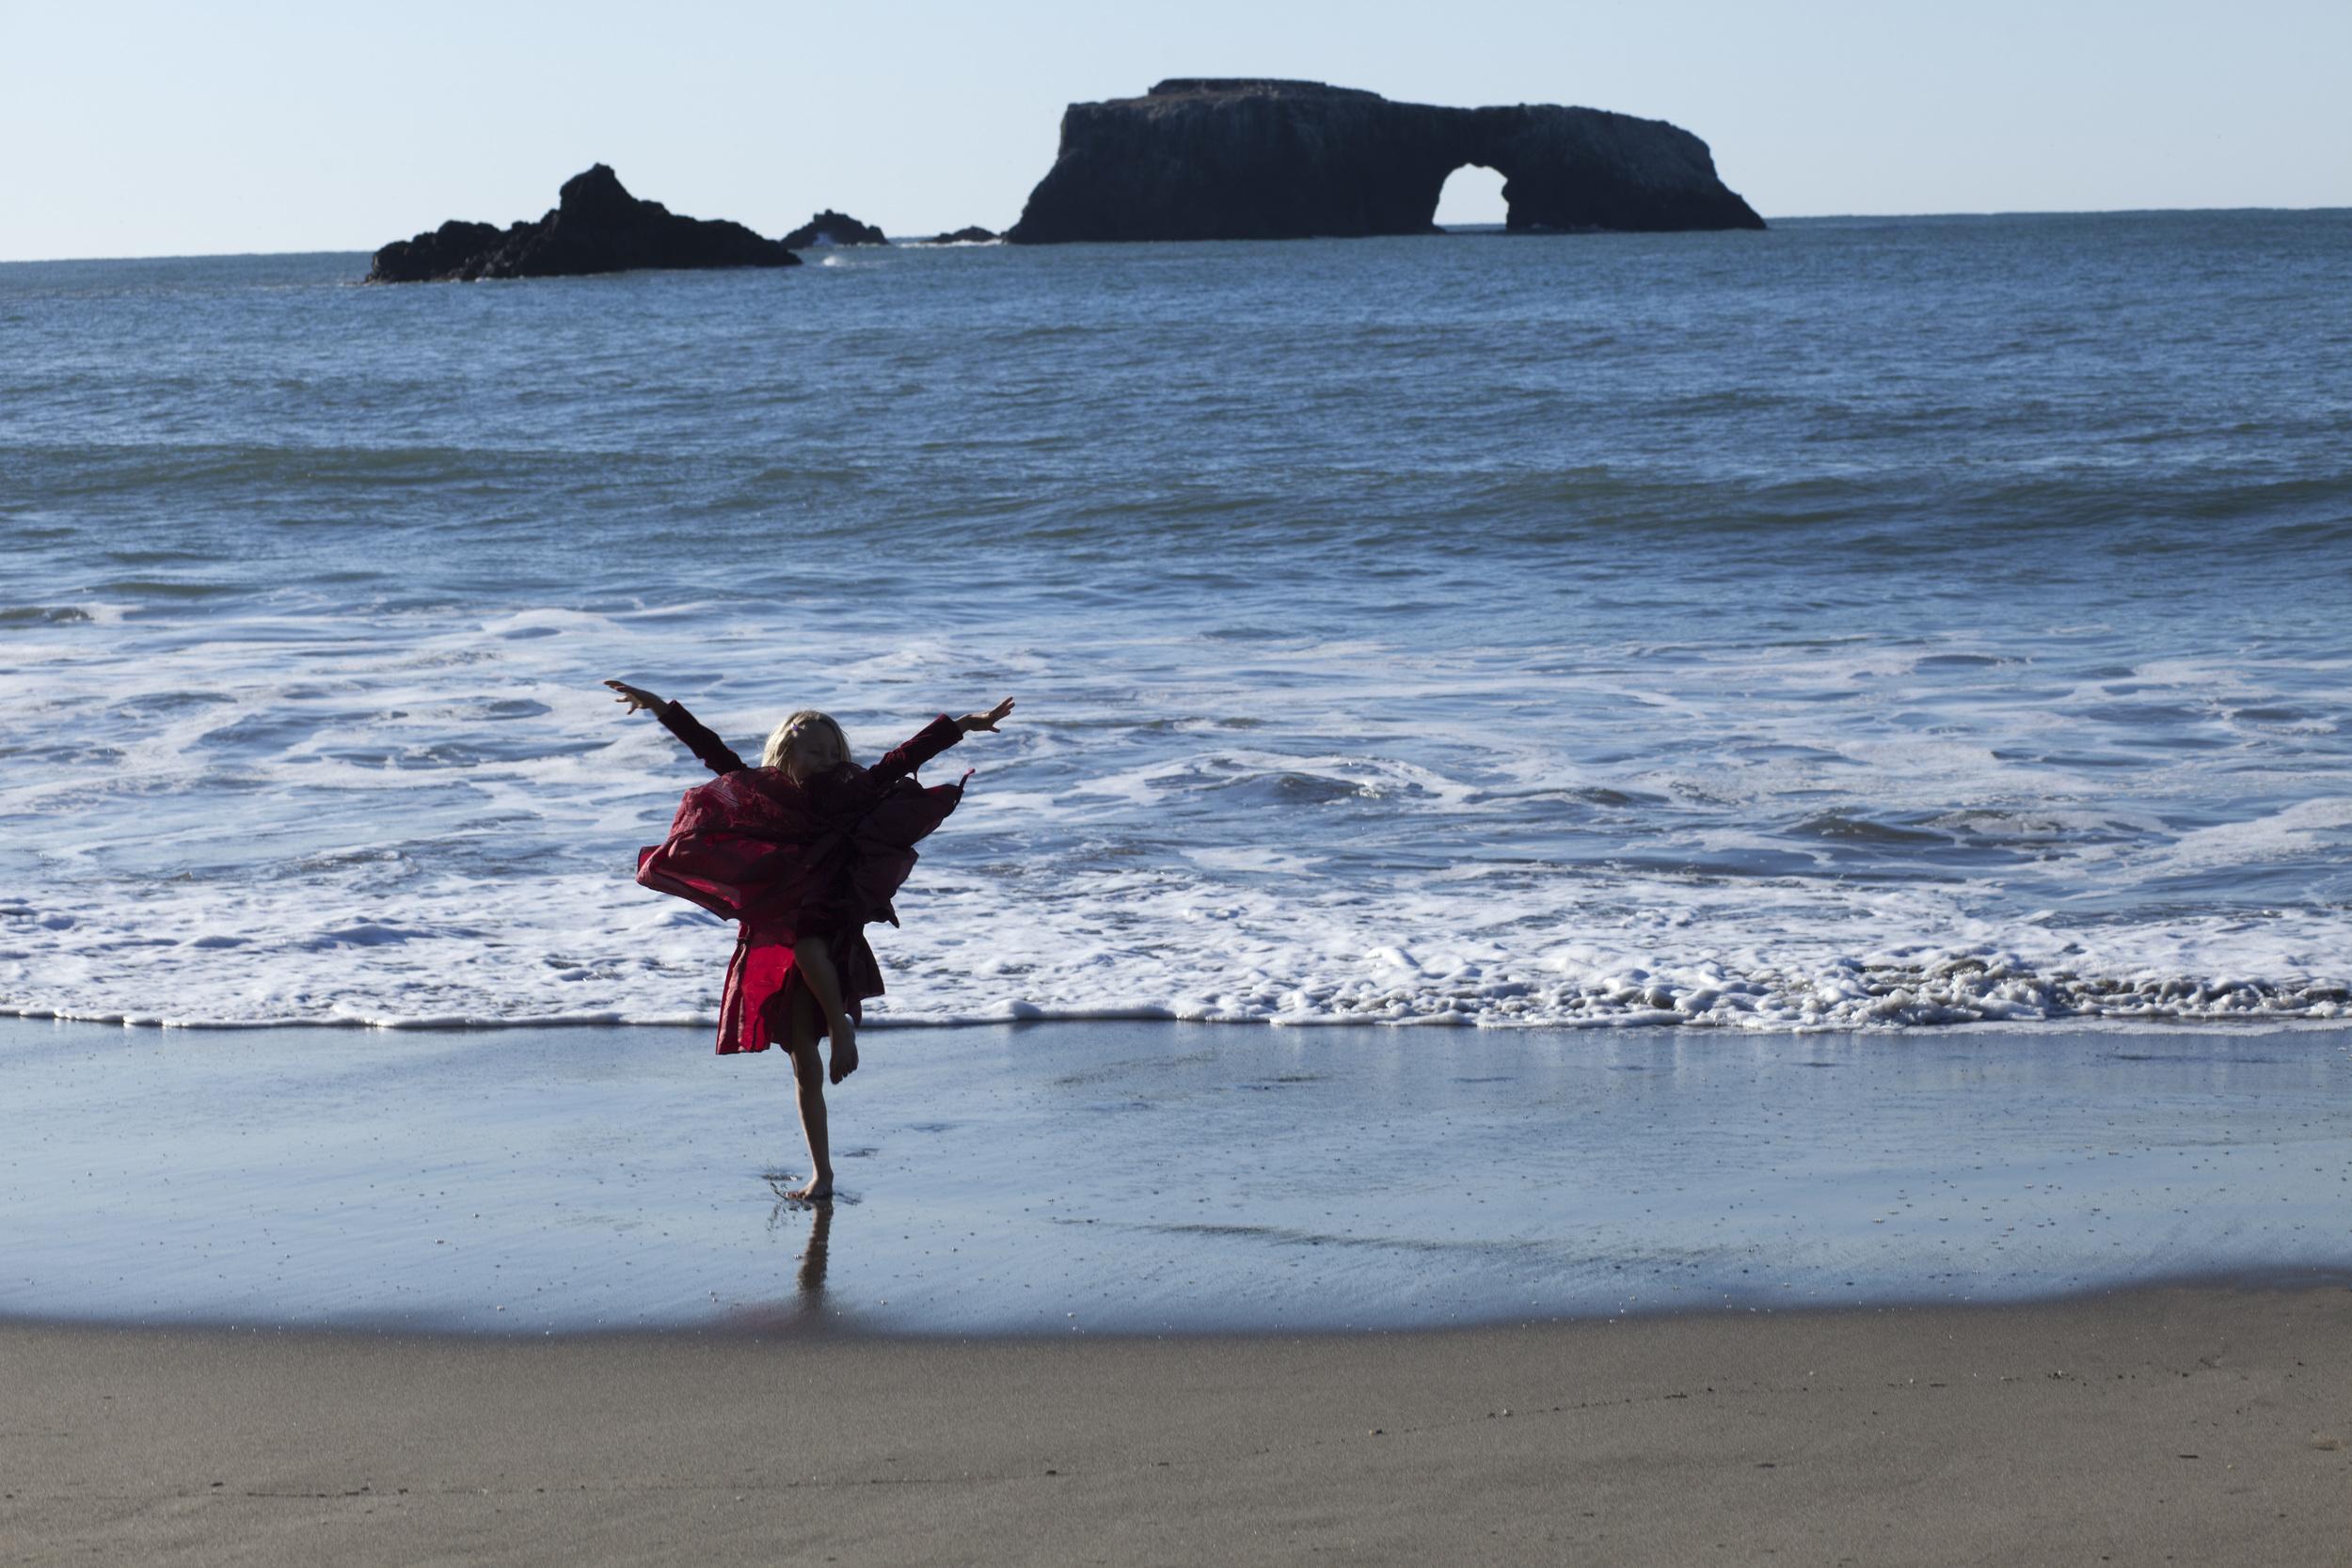 Phoebe on the Beach_MG_8715-nocrop.jpg